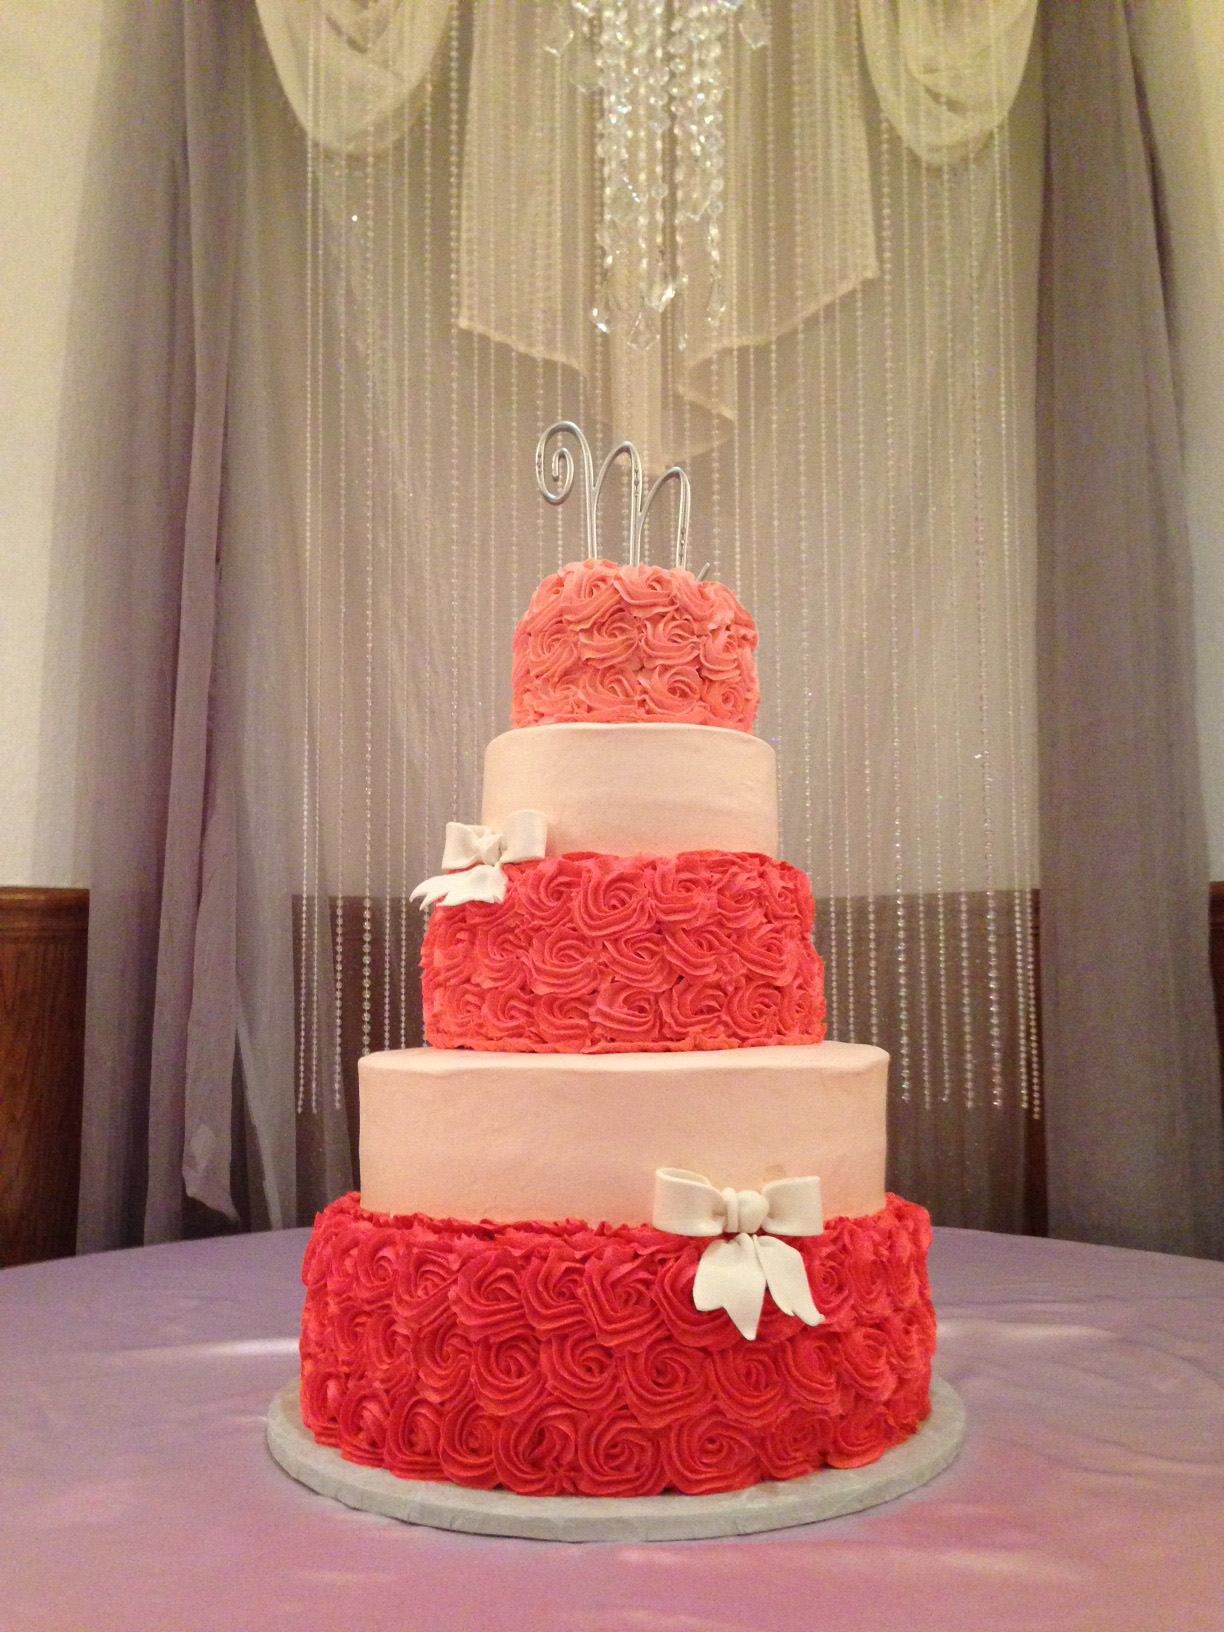 Monochromatic Rosette Cake